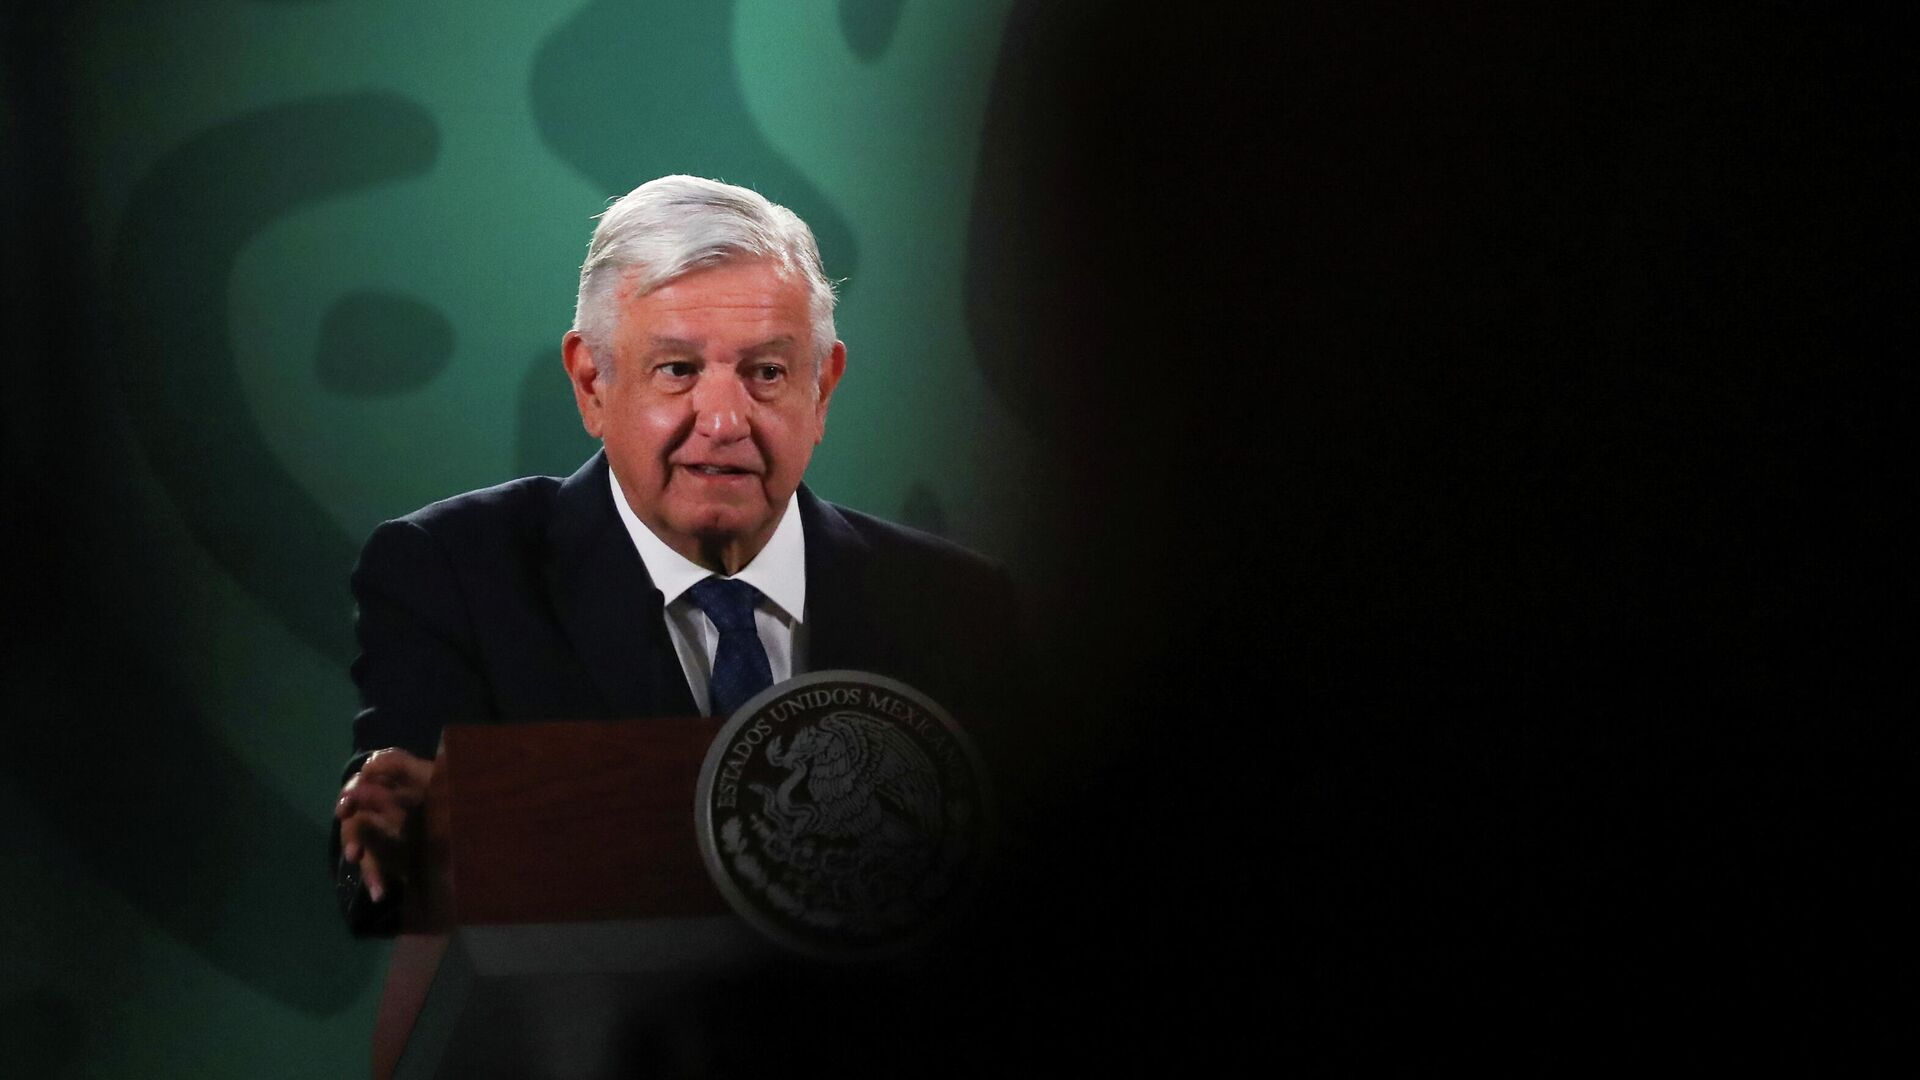 El presidente de México, Andrés Manuel López Obrador - Sputnik Mundo, 1920, 21.04.2021